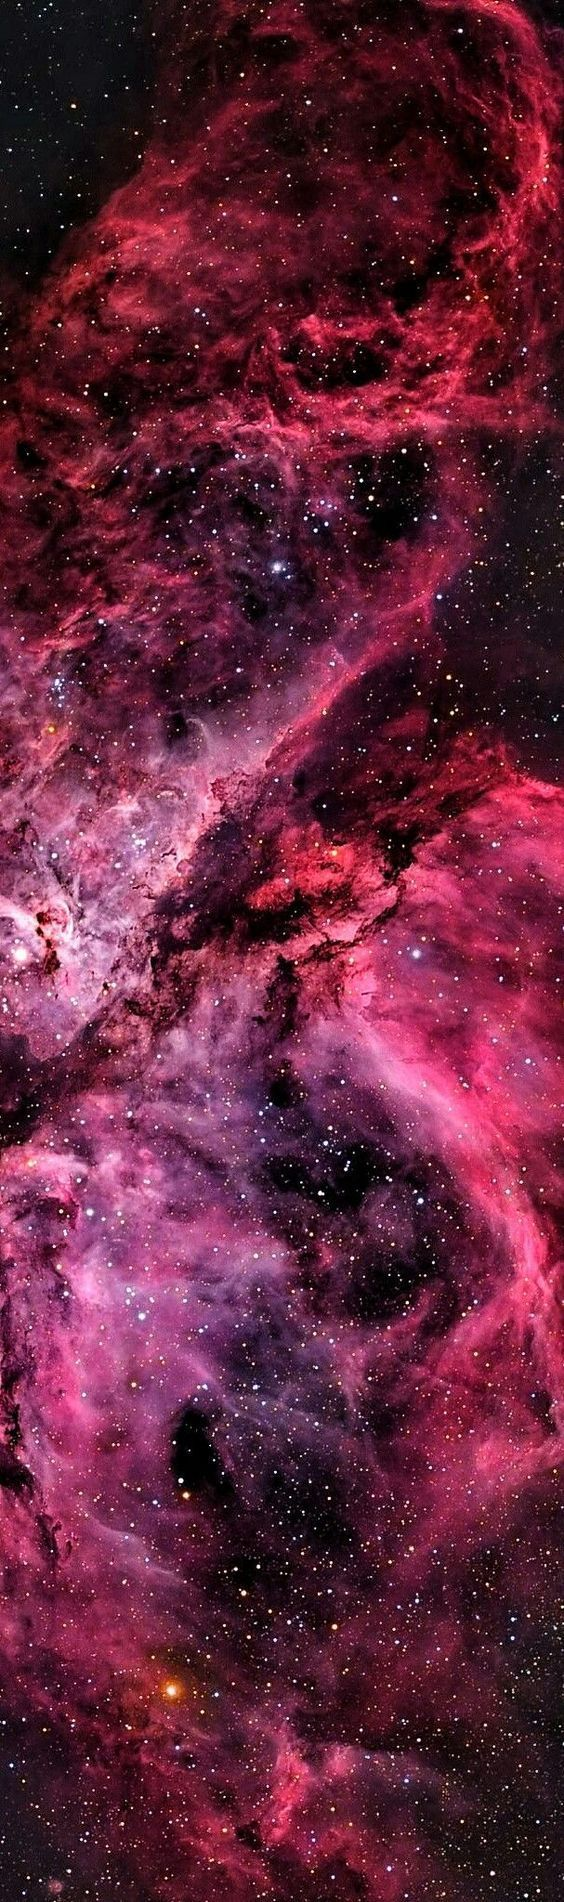 🔮 arcane trail 🔮 | space aesthetics | astronomy, galaxies, carina